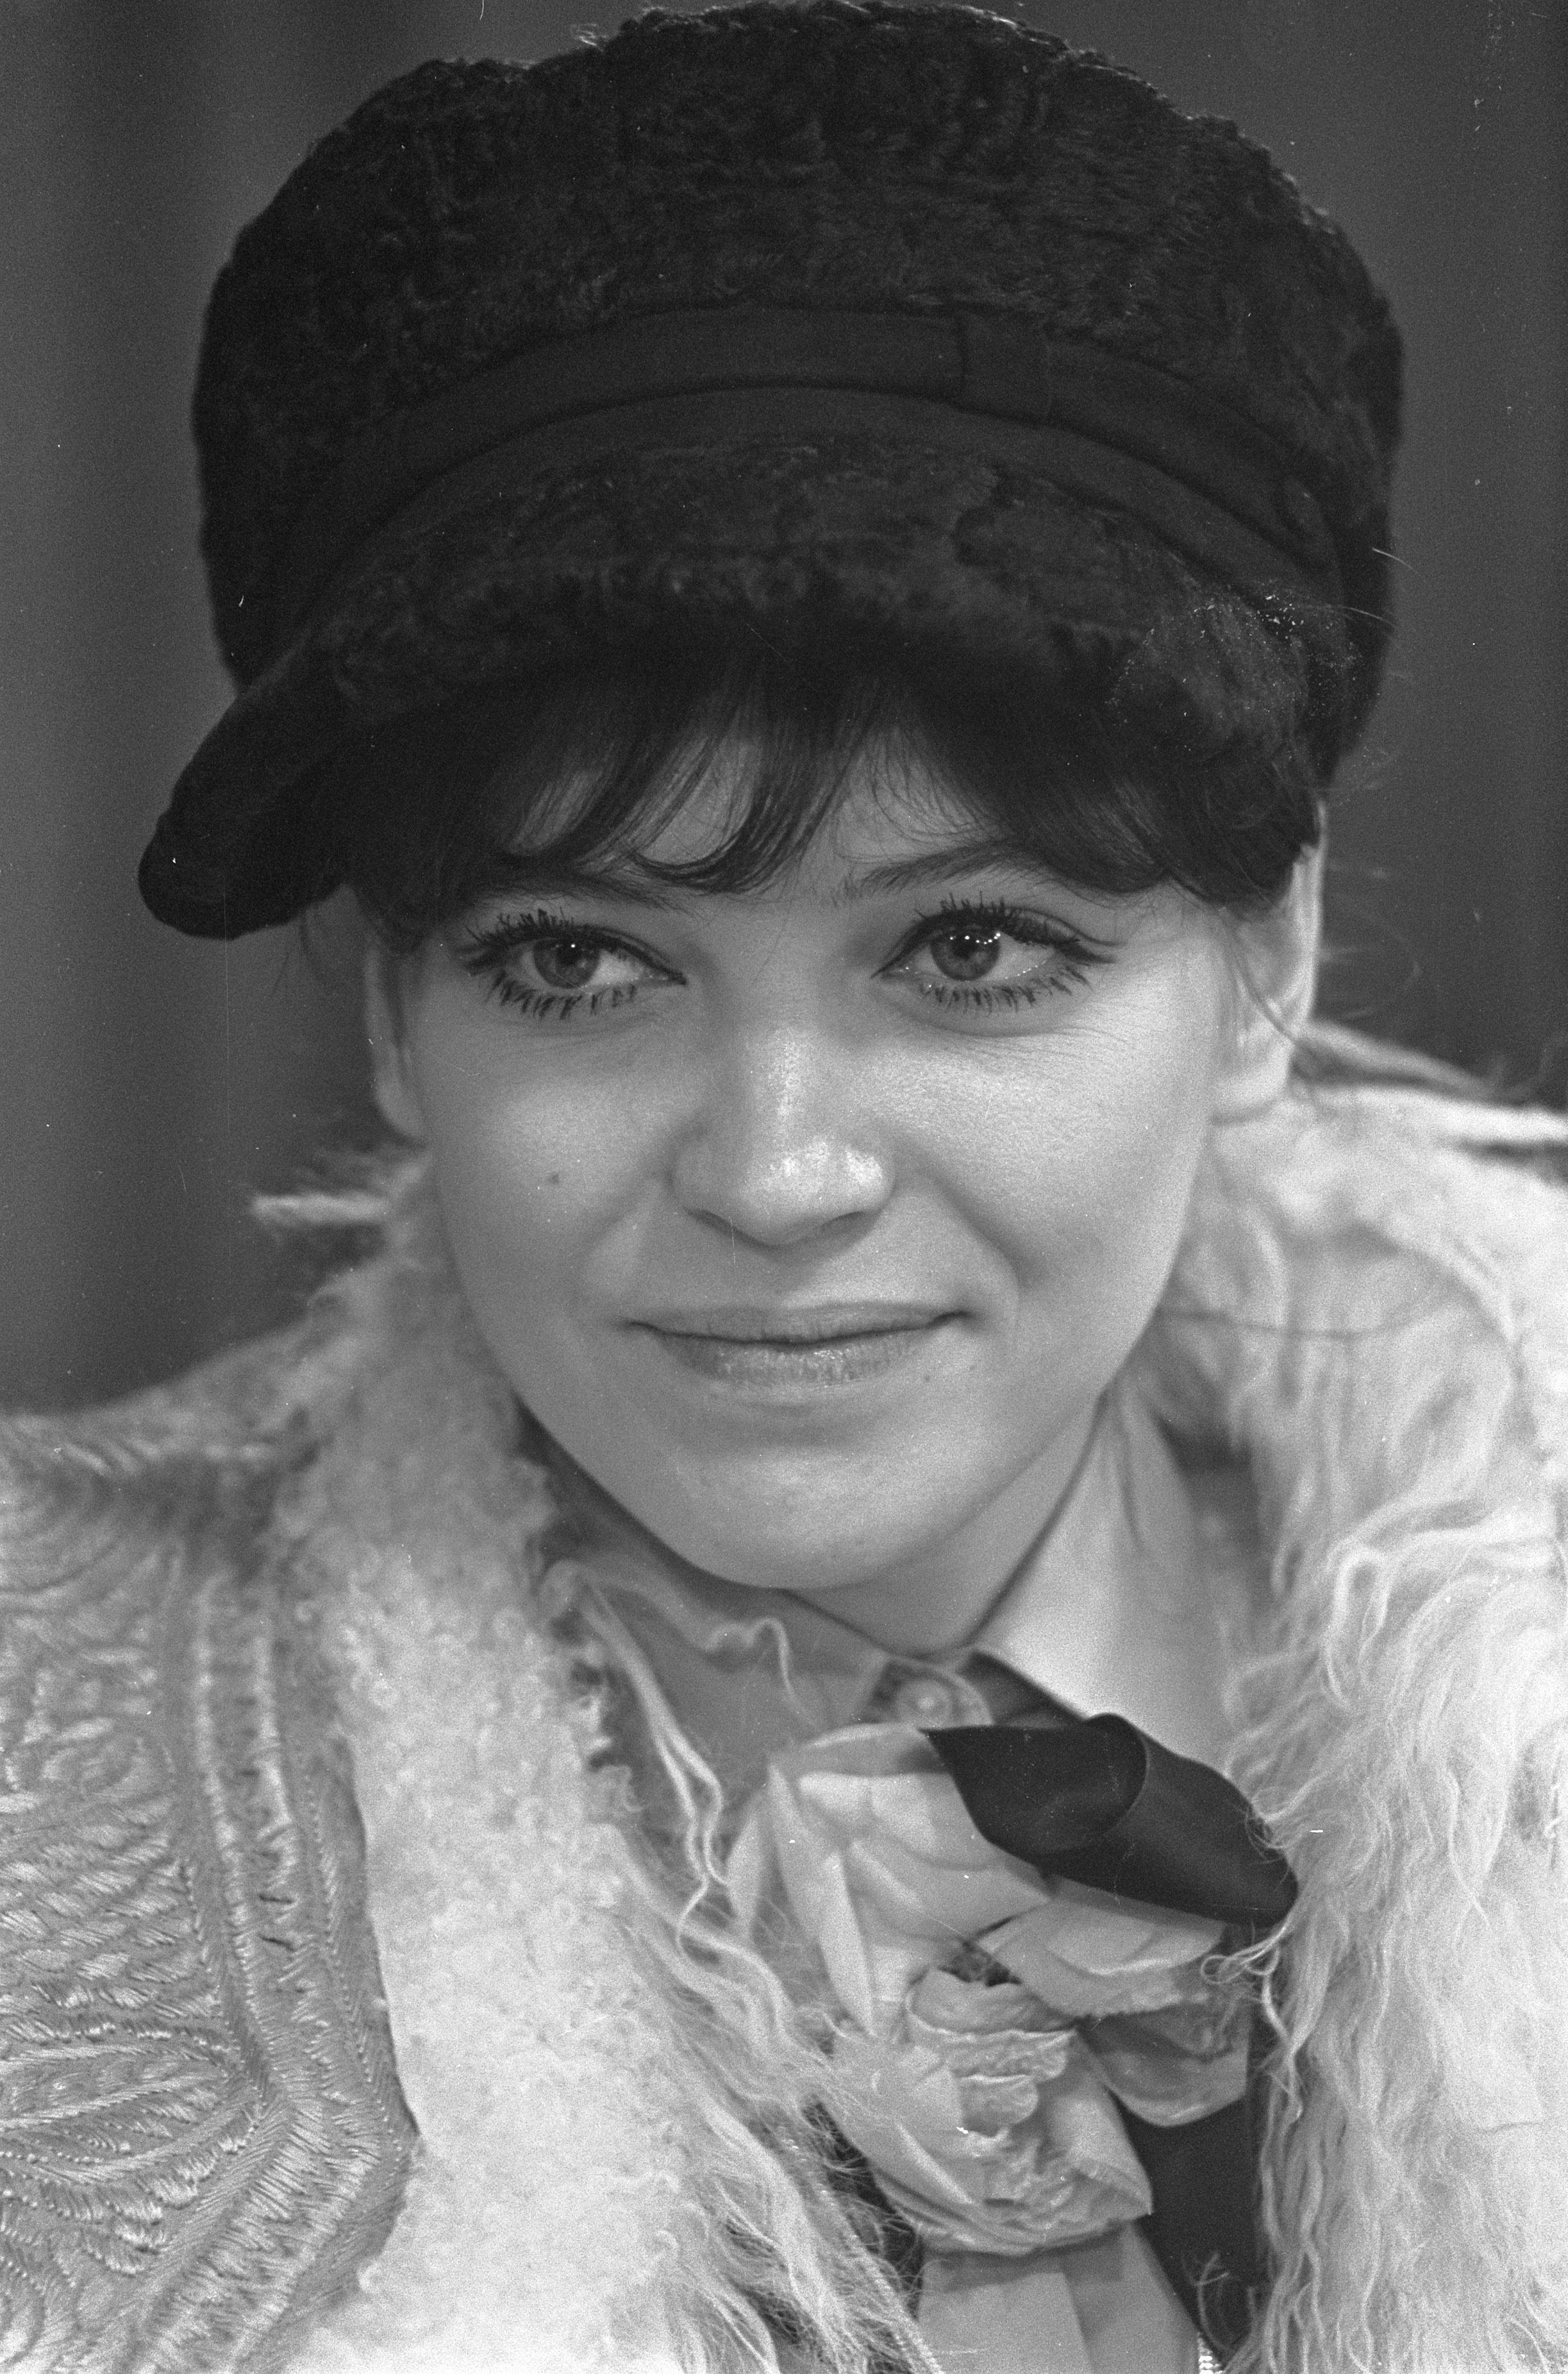 https://upload.wikimedia.org/wikipedia/commons/c/c5/Aankomst_Franse_filmster_Anna_Karina_op_Schiphol%2C_Anna_Karina_tijdens_persconfer%2C_Bestanddeelnr_921-0593.jpg